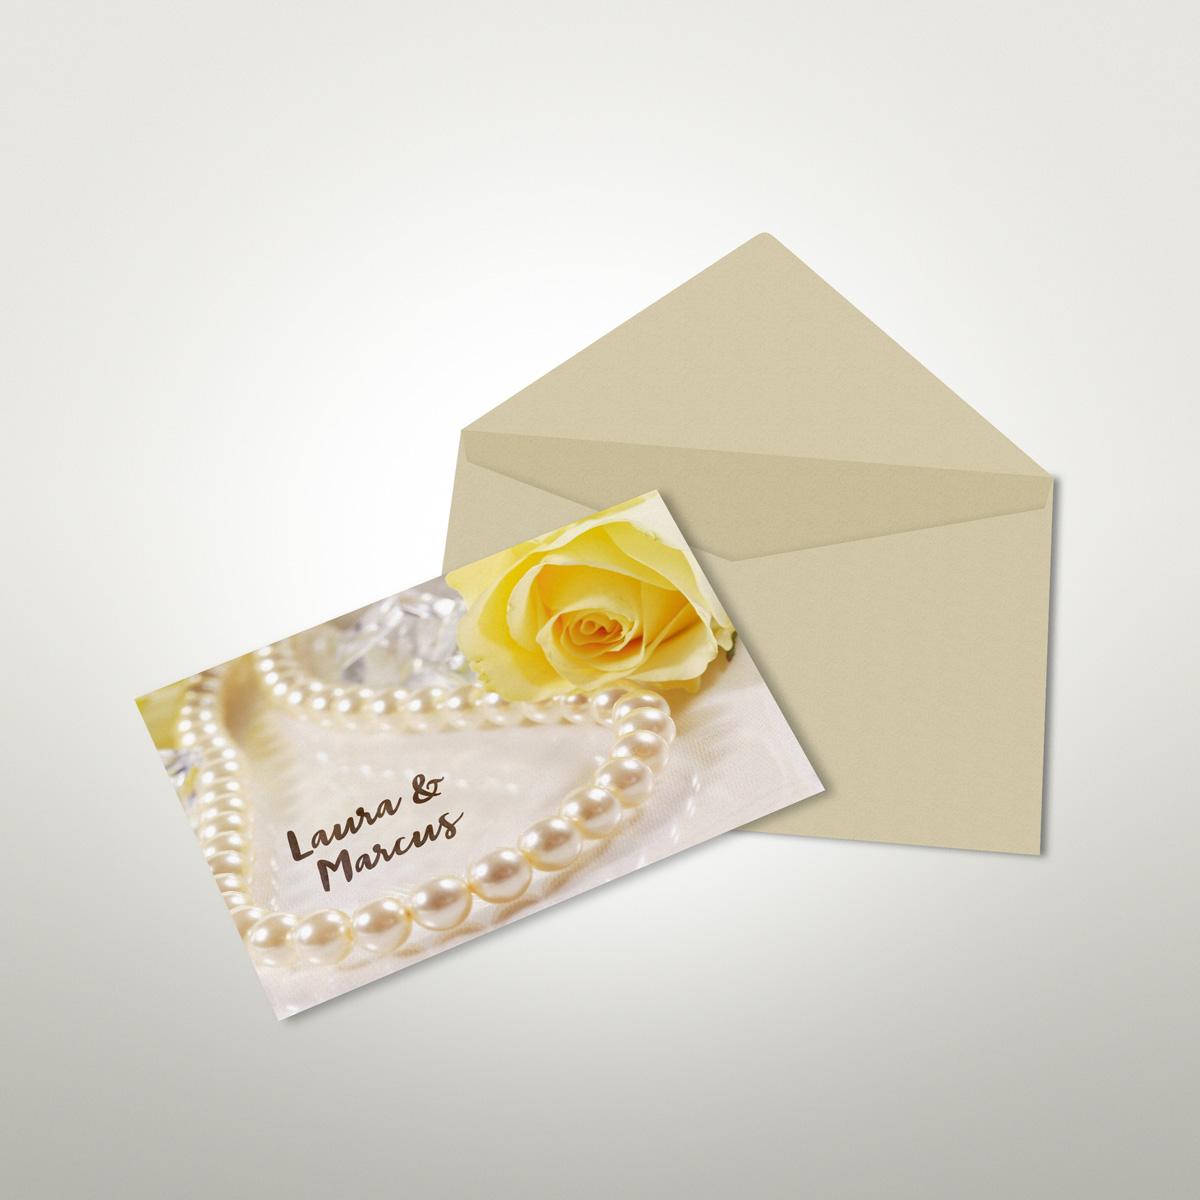 best wedding card free artwork check london ec3 near me